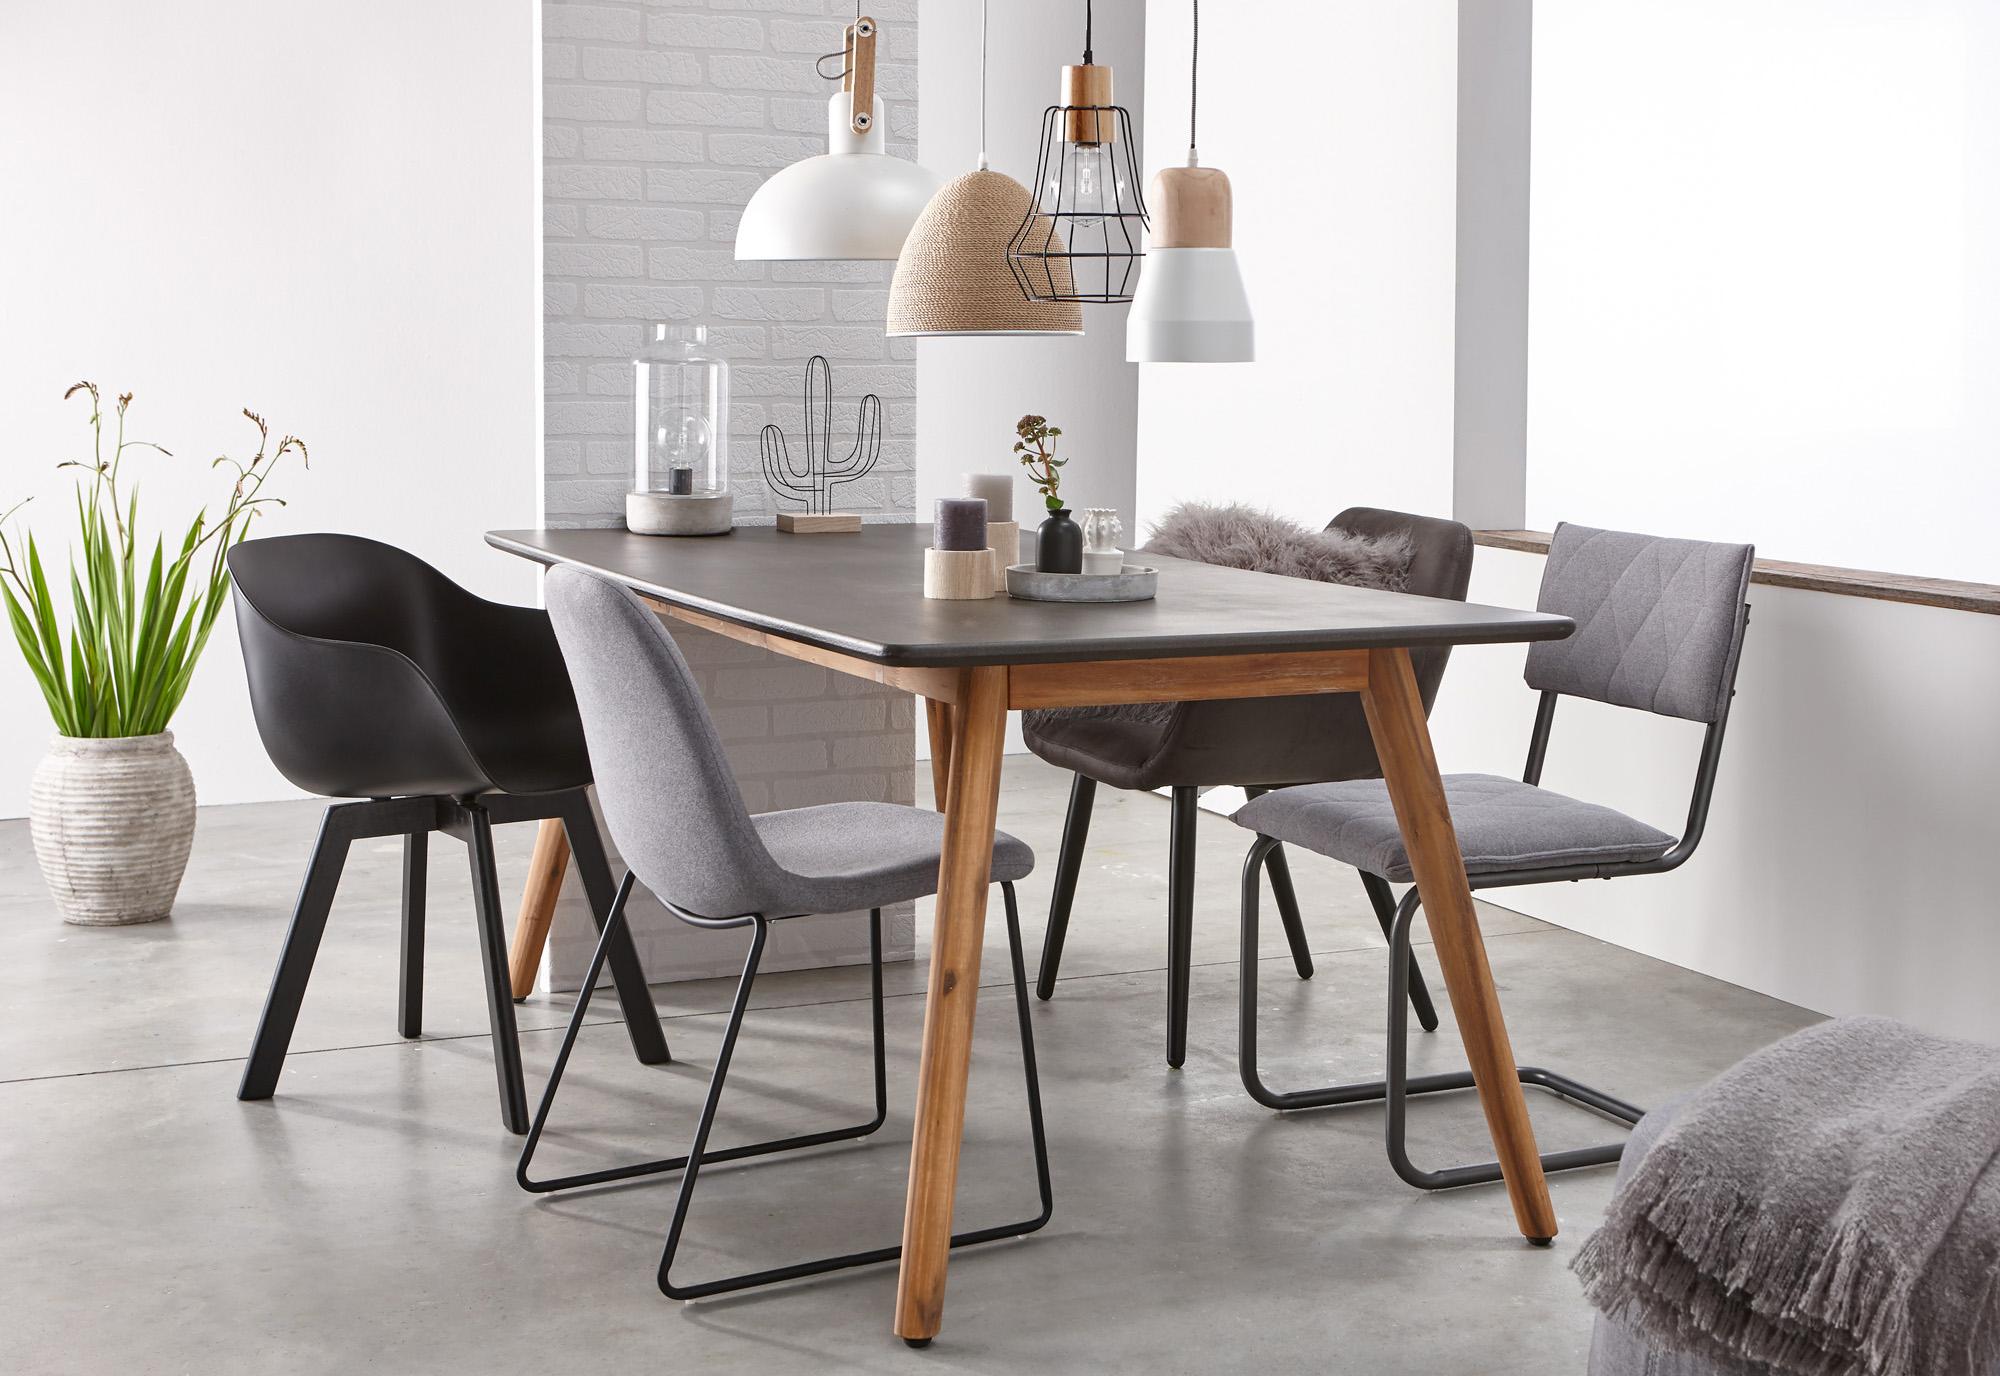 lampen-meubels